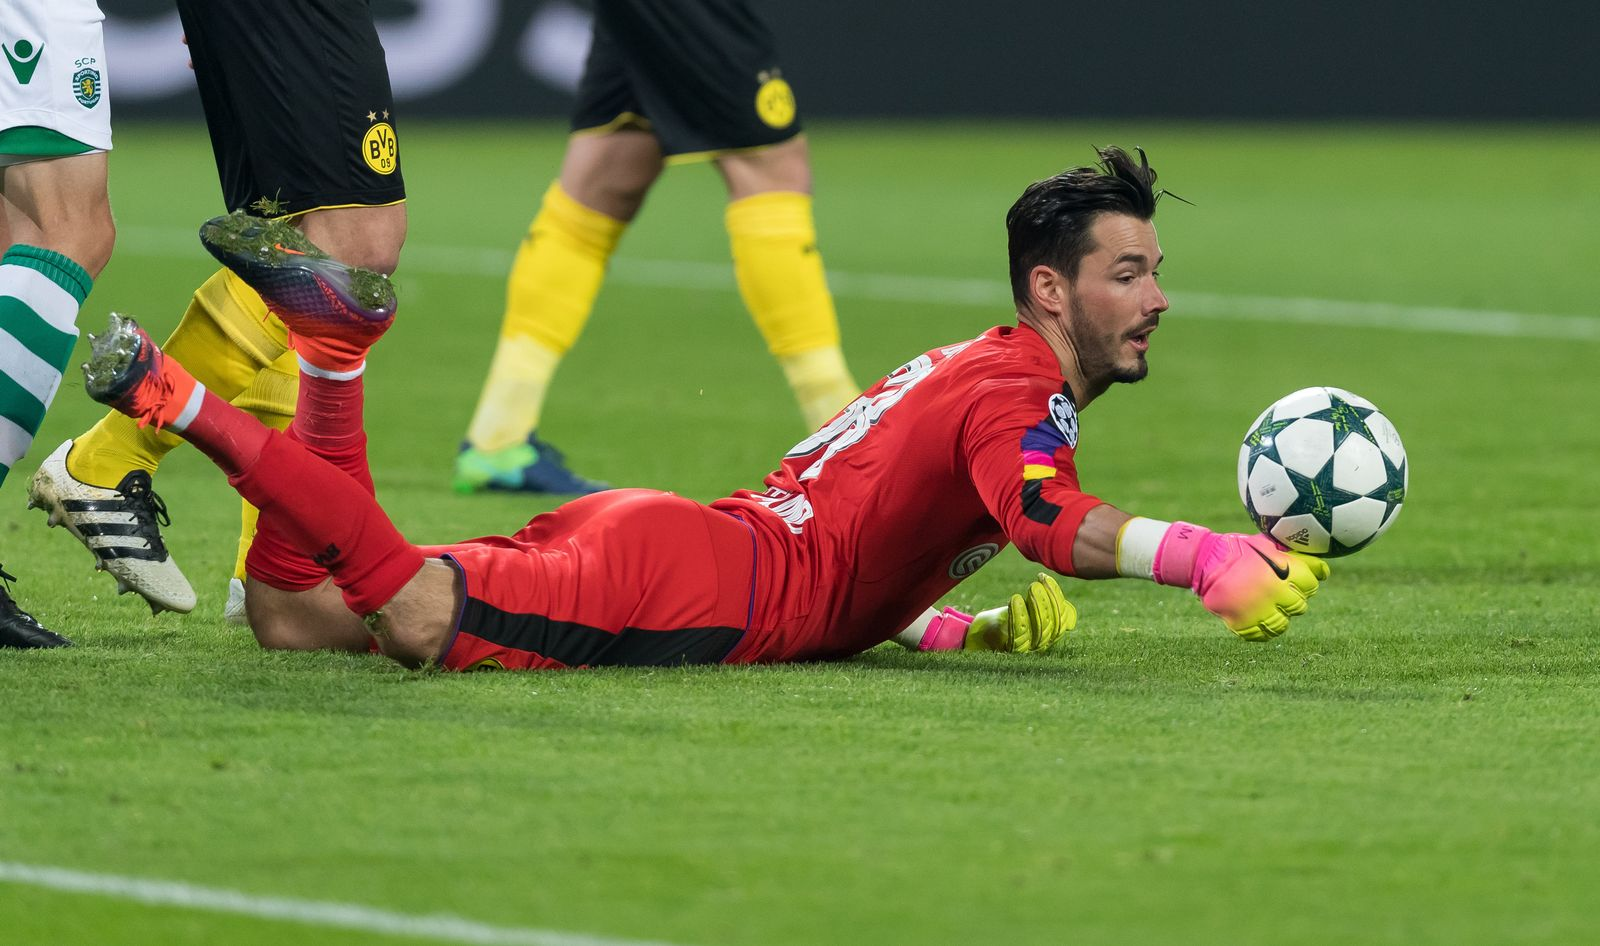 Borussia Dortmund - Sporting Lissabon